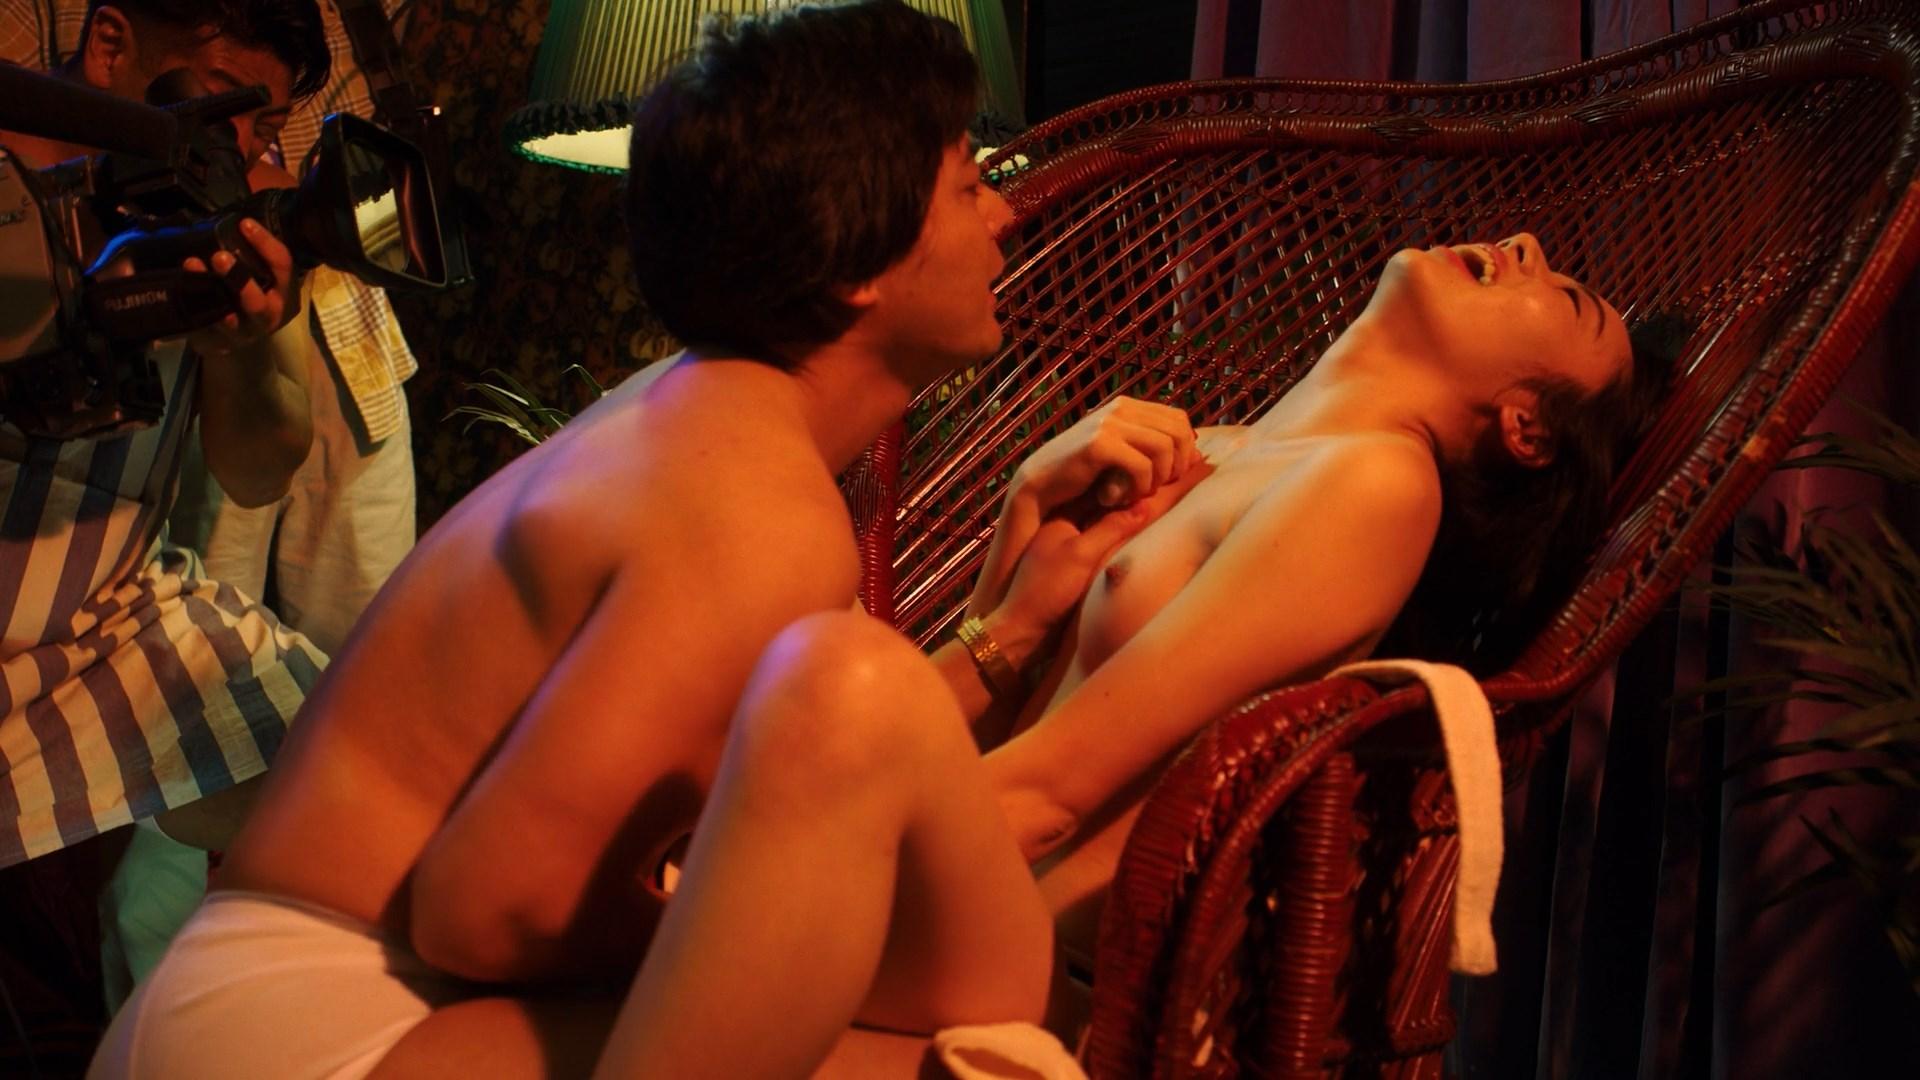 Ruri Shinato nude, Umi Todo nude - The Naked Director s01e01 (2019)